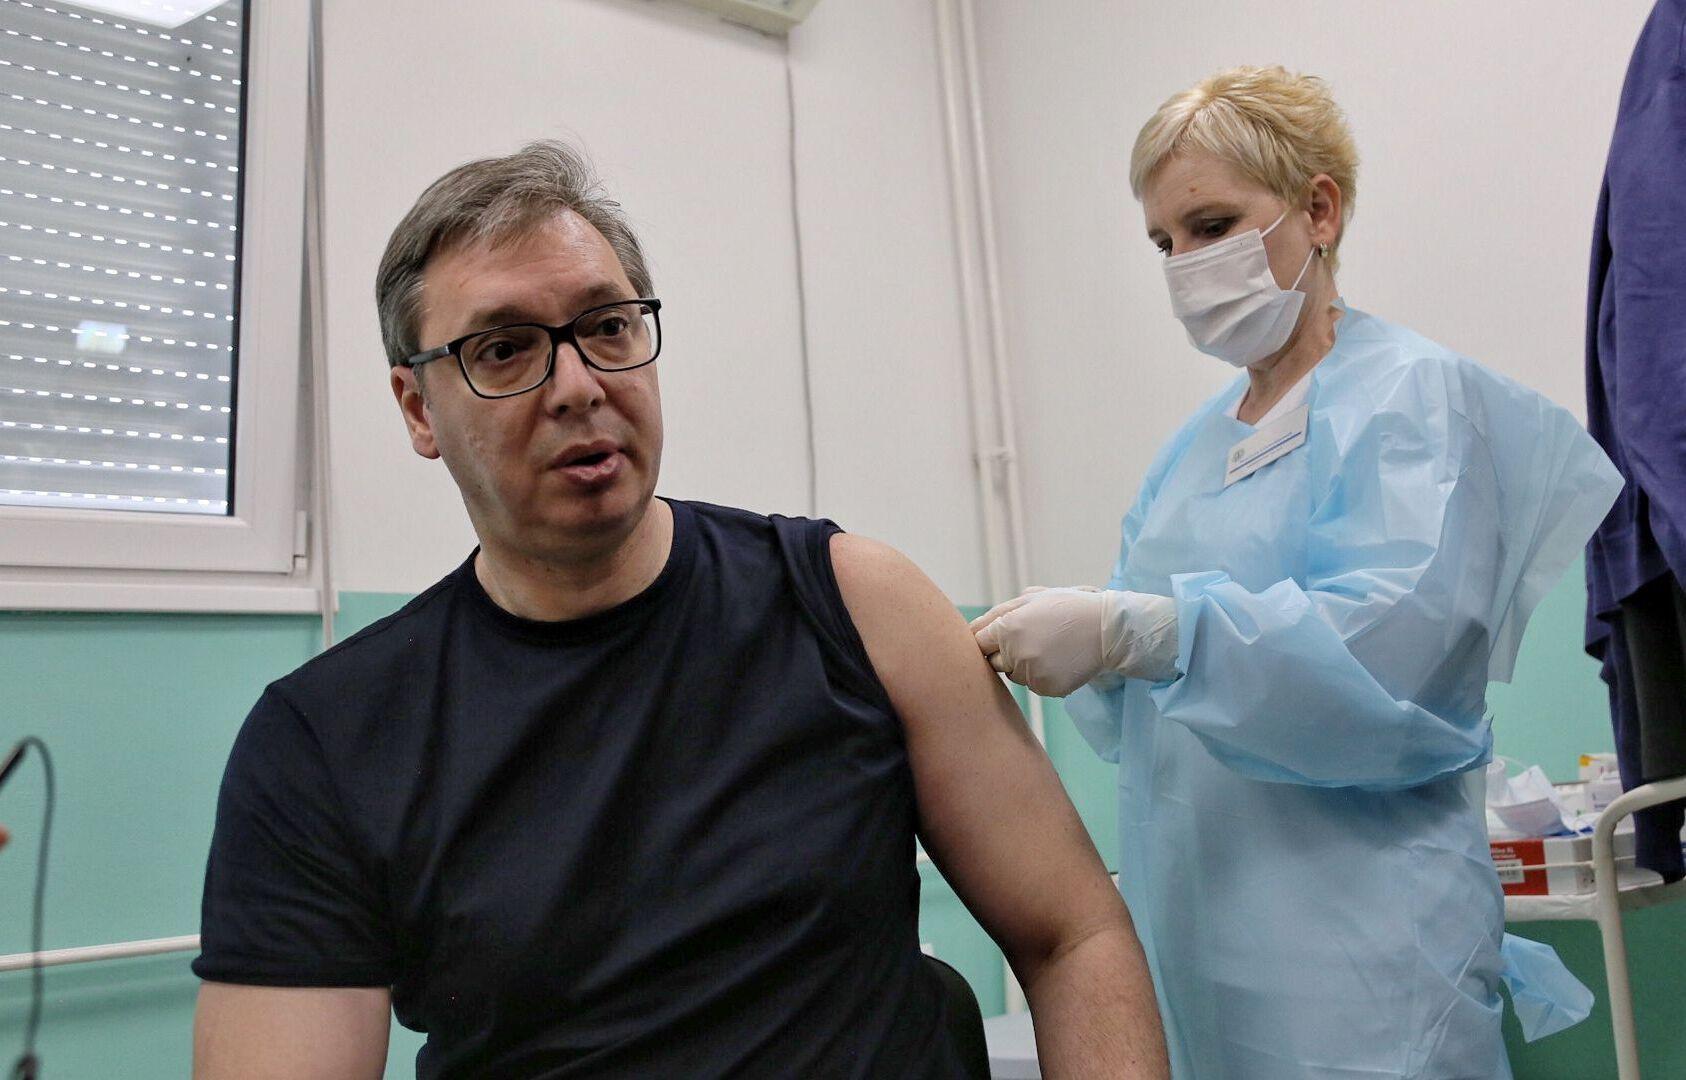 648x415 president serbe aleksandar vucic recoit deuxieme dose vaccin chinois sinopharm doljevac serbie 27 avril 2021